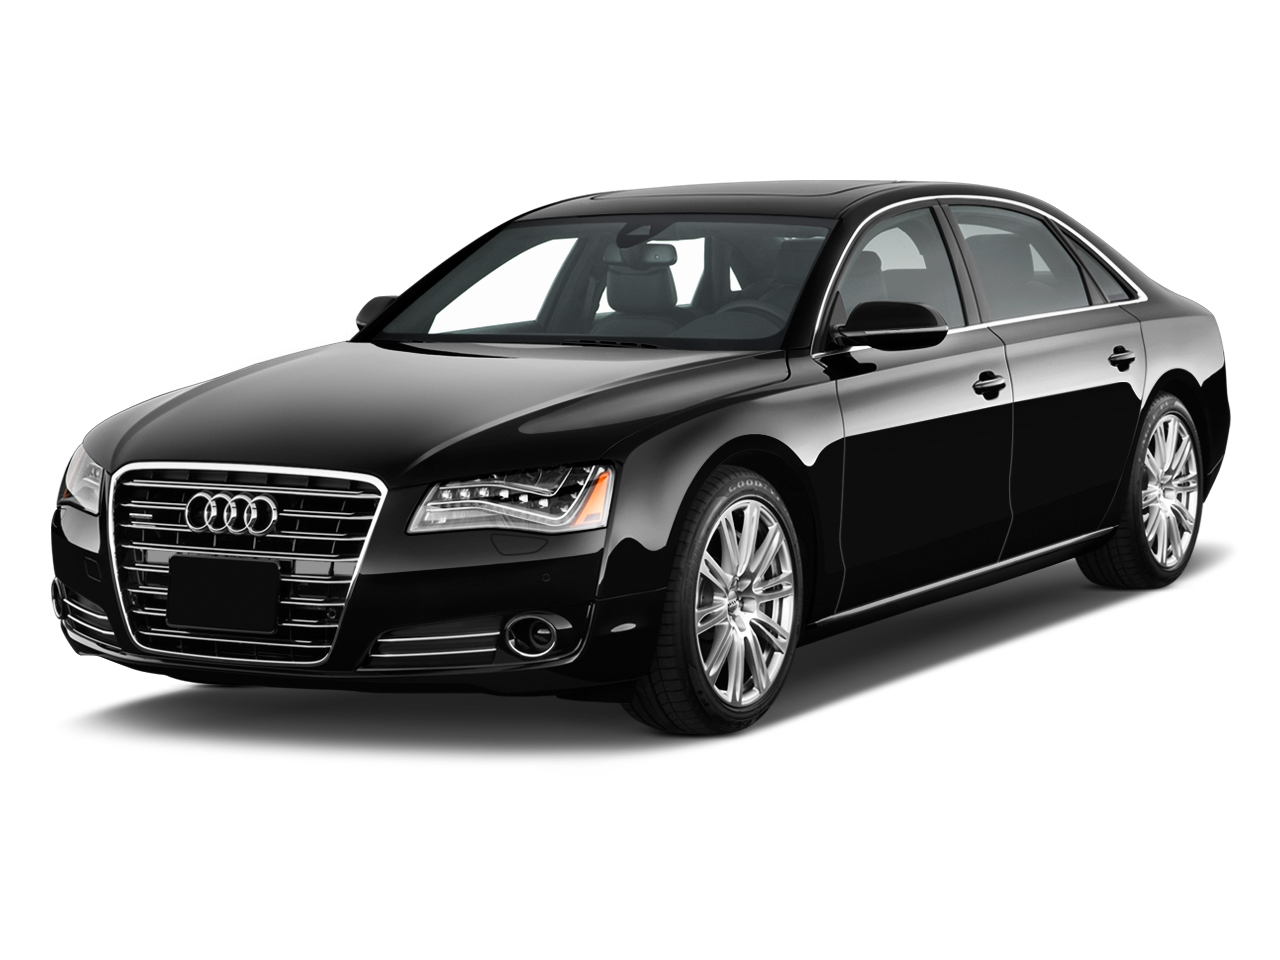 Kelebihan Audi 2012 Murah Berkualitas